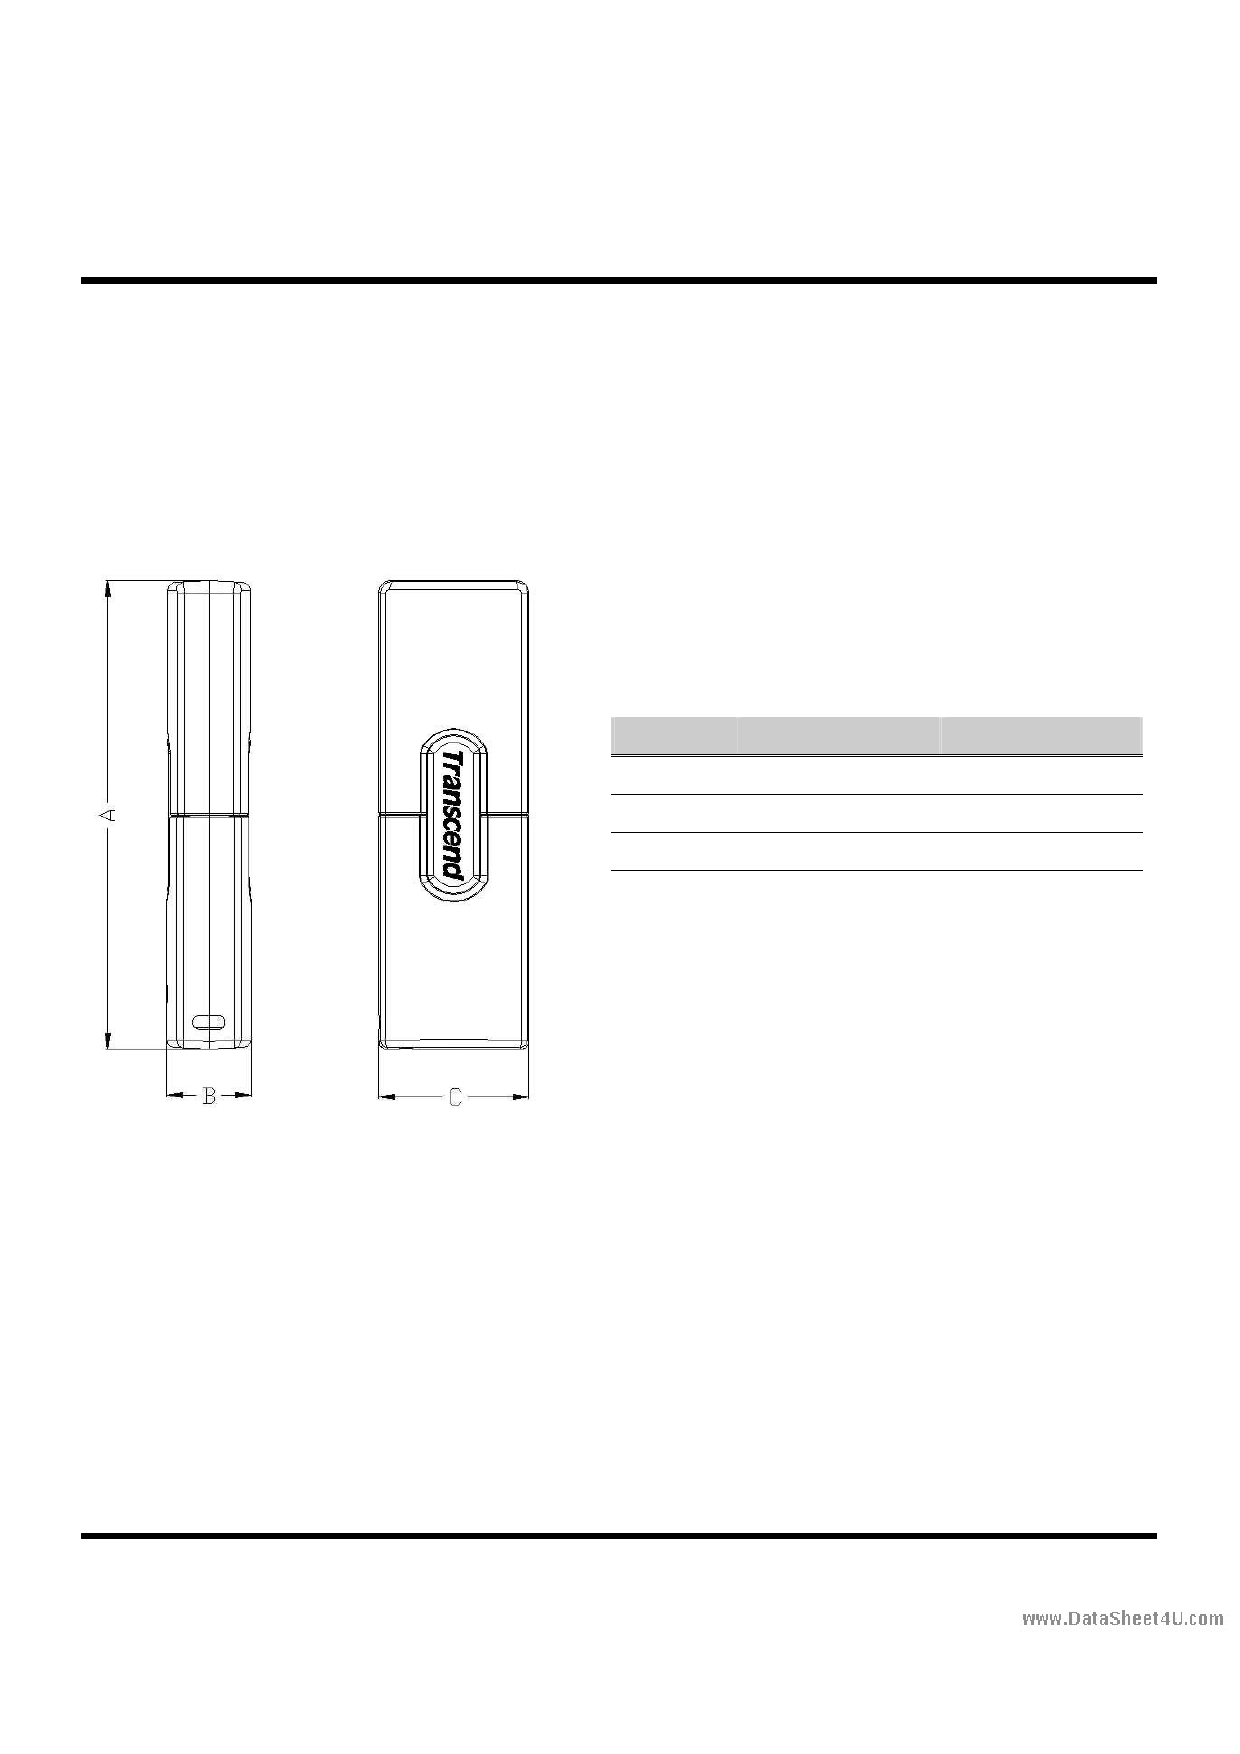 TS2GJF150 Datasheet, TS2GJF150 PDF,ピン配置, 機能